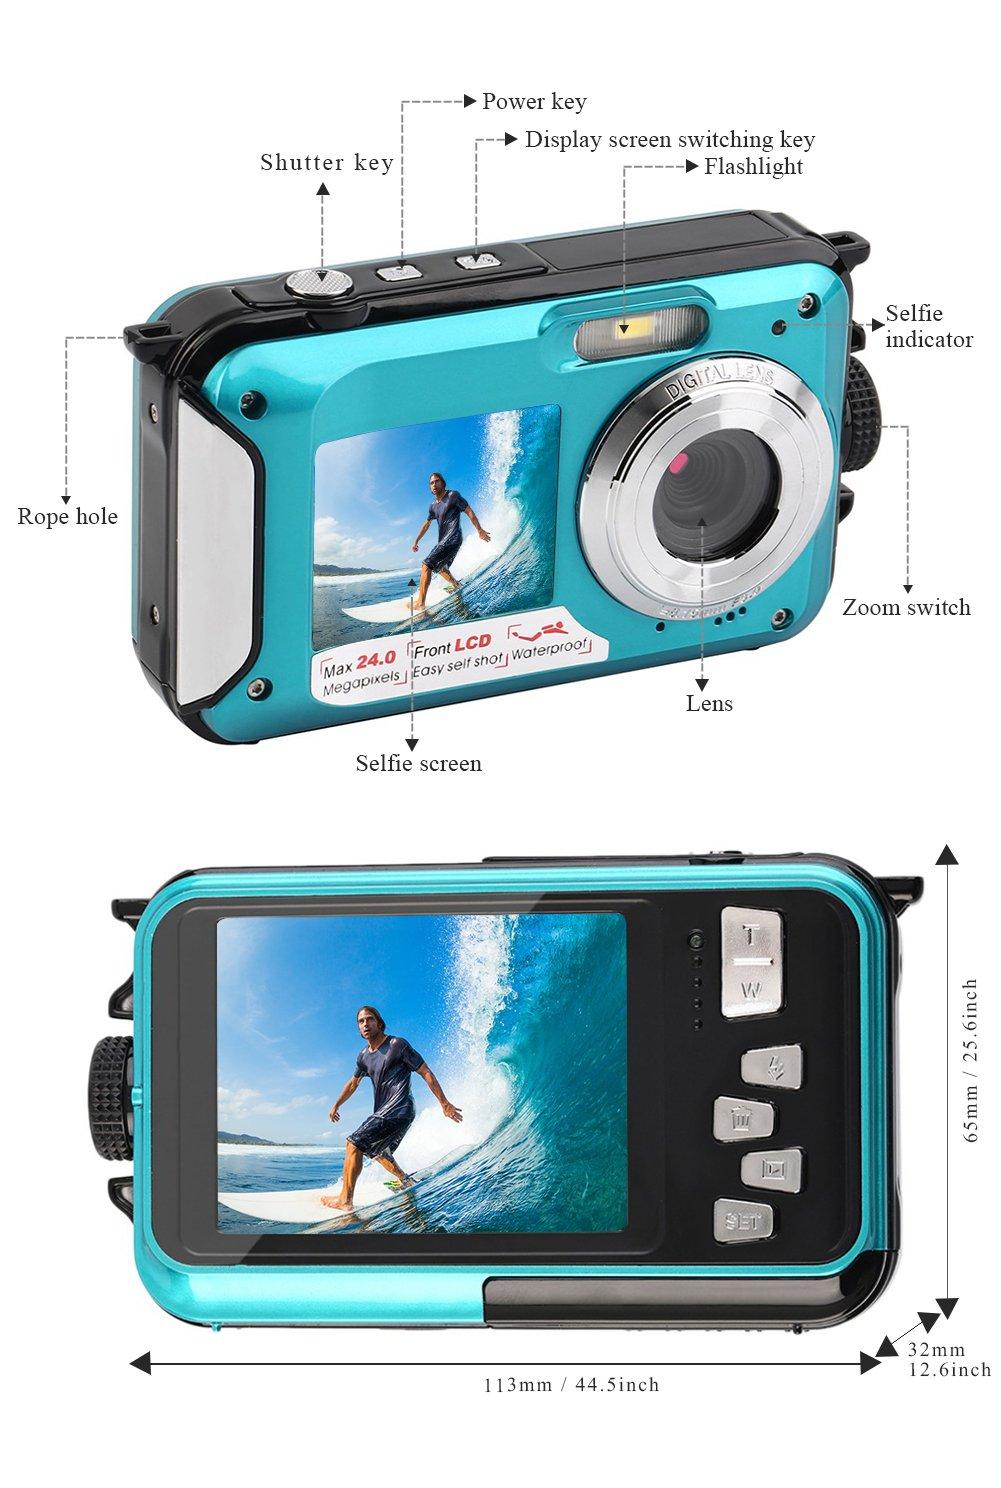 YISENCE Waterproof Digital Camera 24MP Underwater Camcorder Video Recorder FULL HD 1080P Selfie Dual Screen DV Recording … (C8) by YISENCE (Image #4)